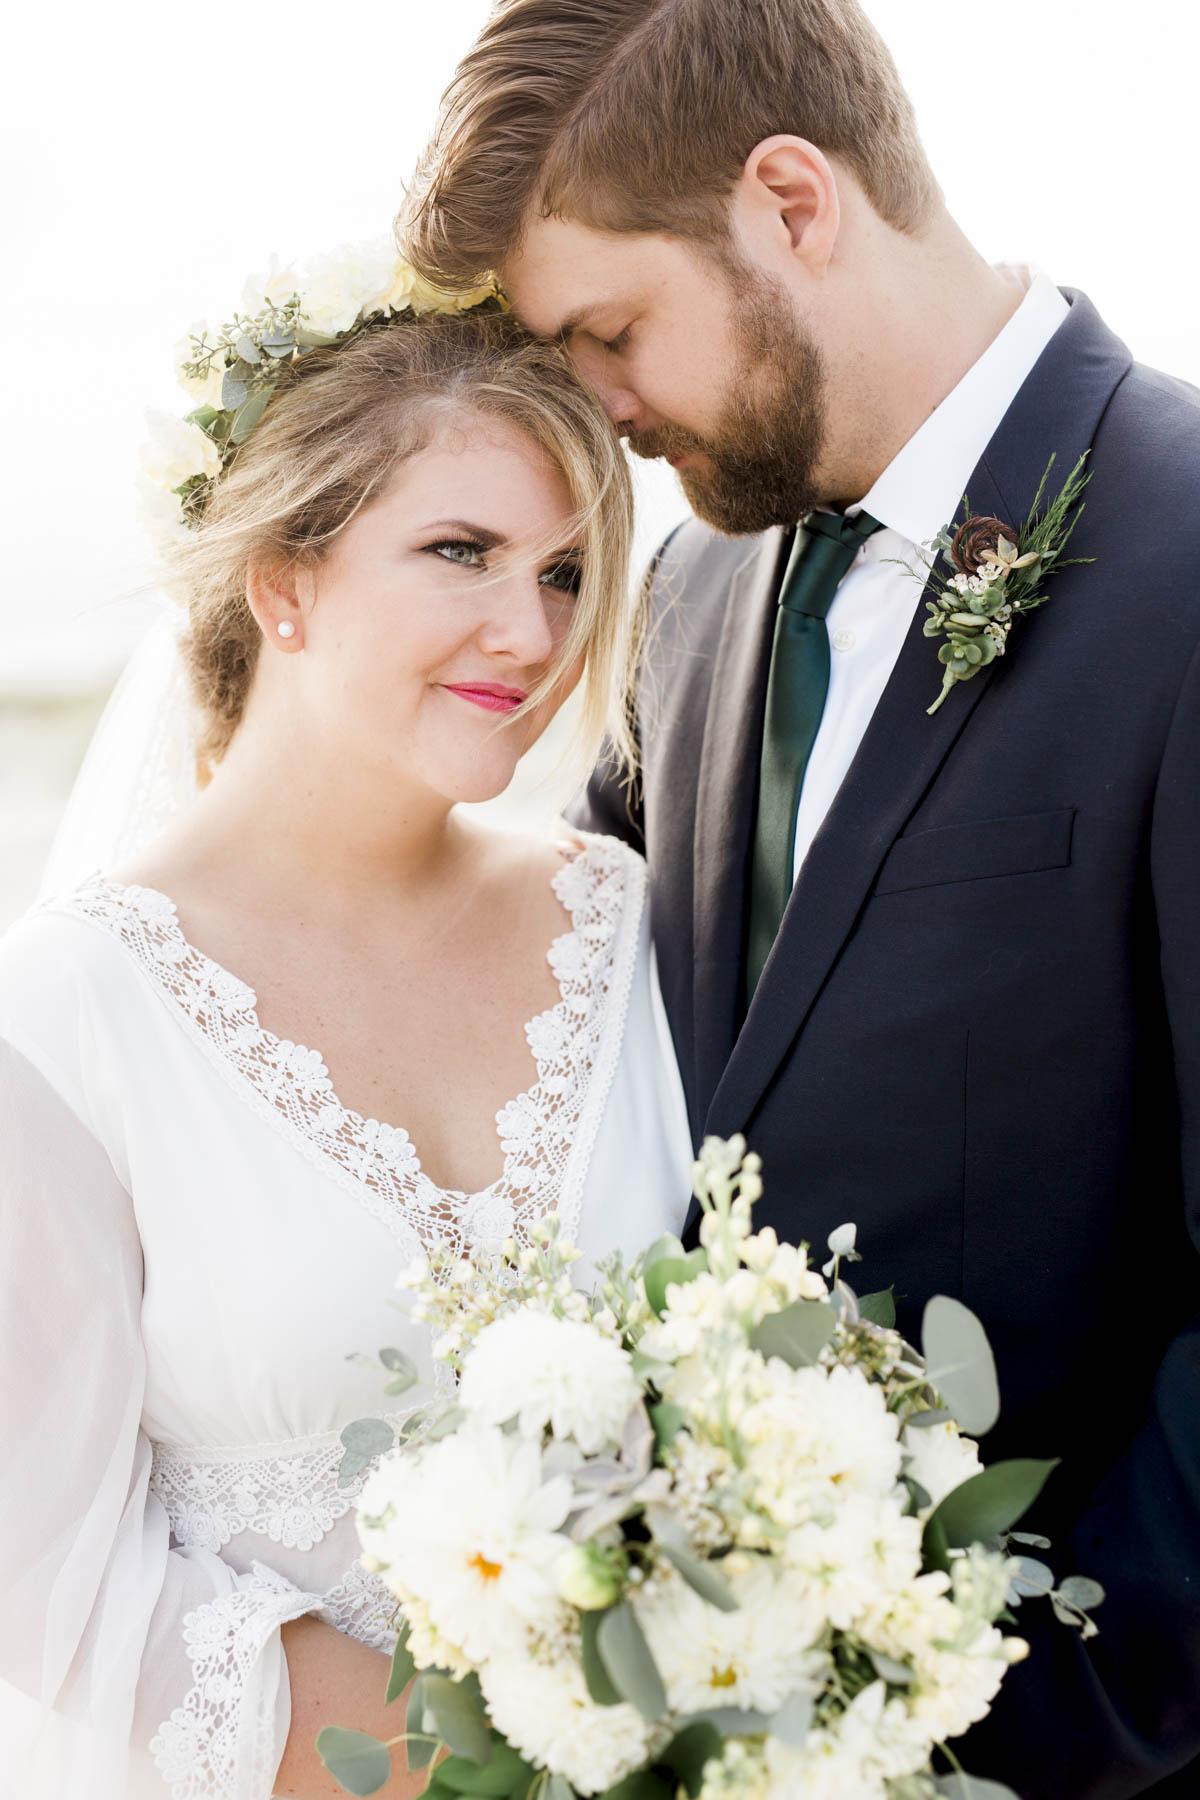 shotbychelsea_wedding_blog-41.jpg